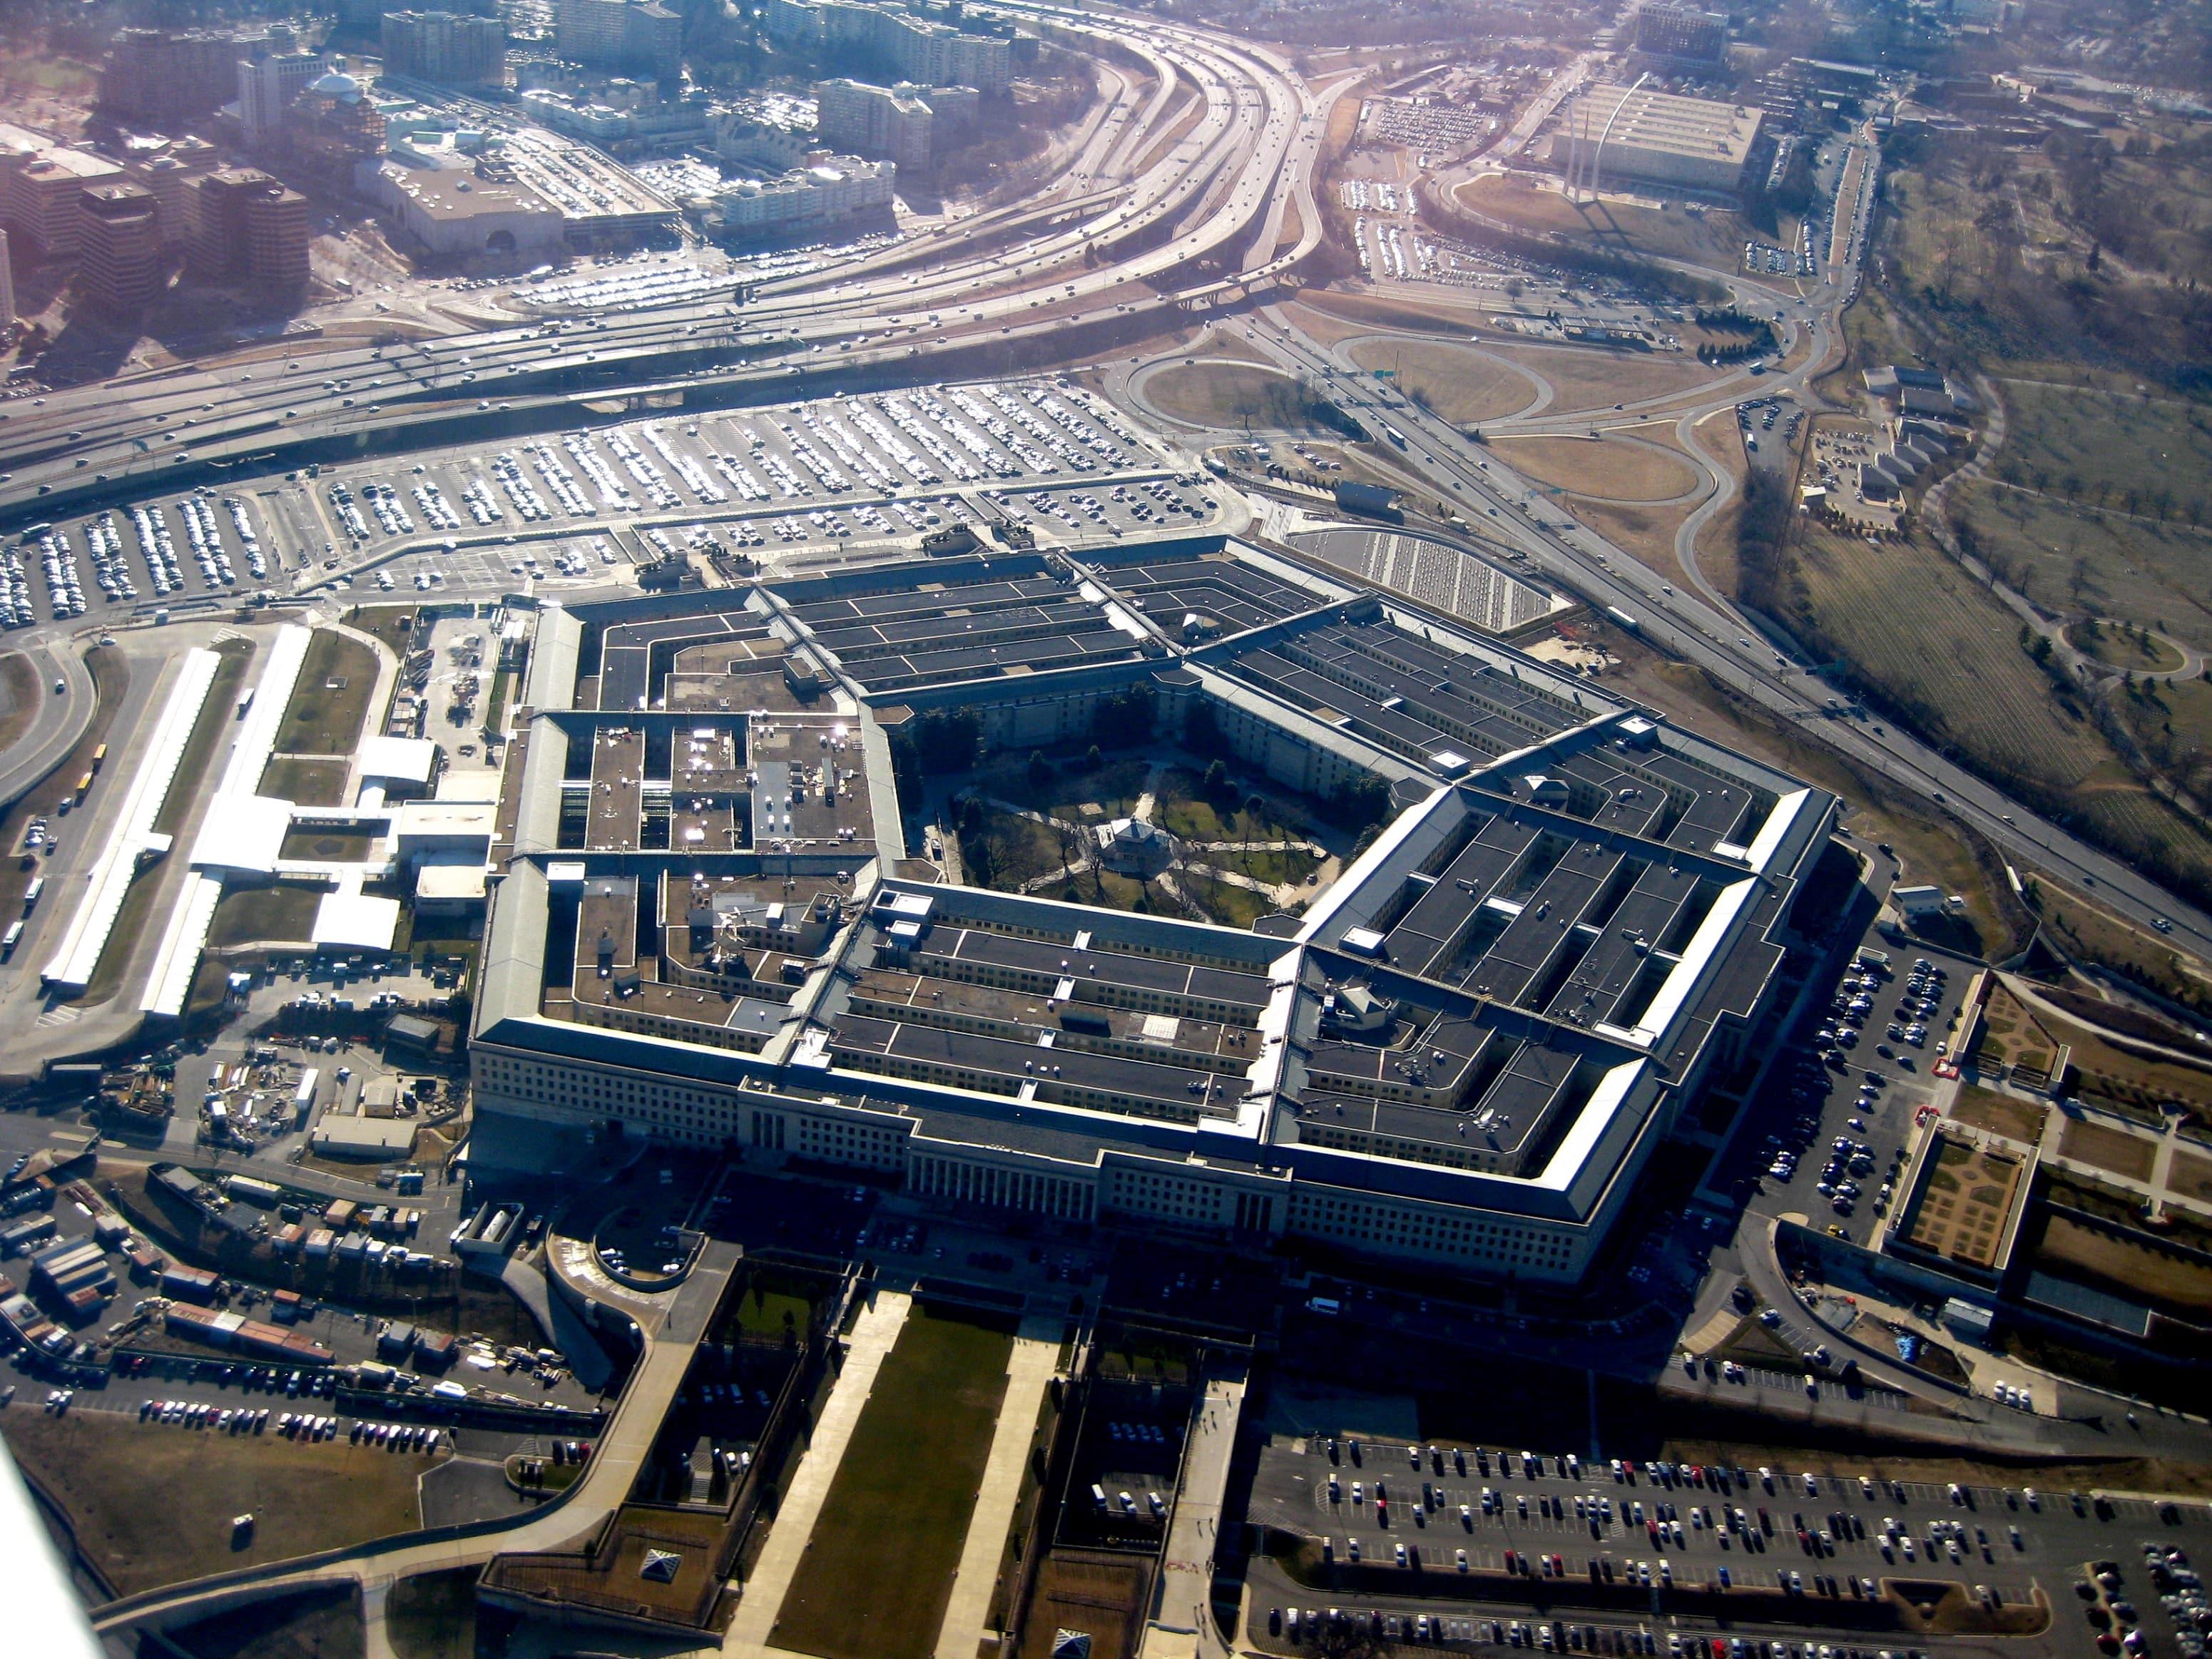 http://www.la-notizia.net/wp-content/uploads/2017/12/The-Pentagon.jpg